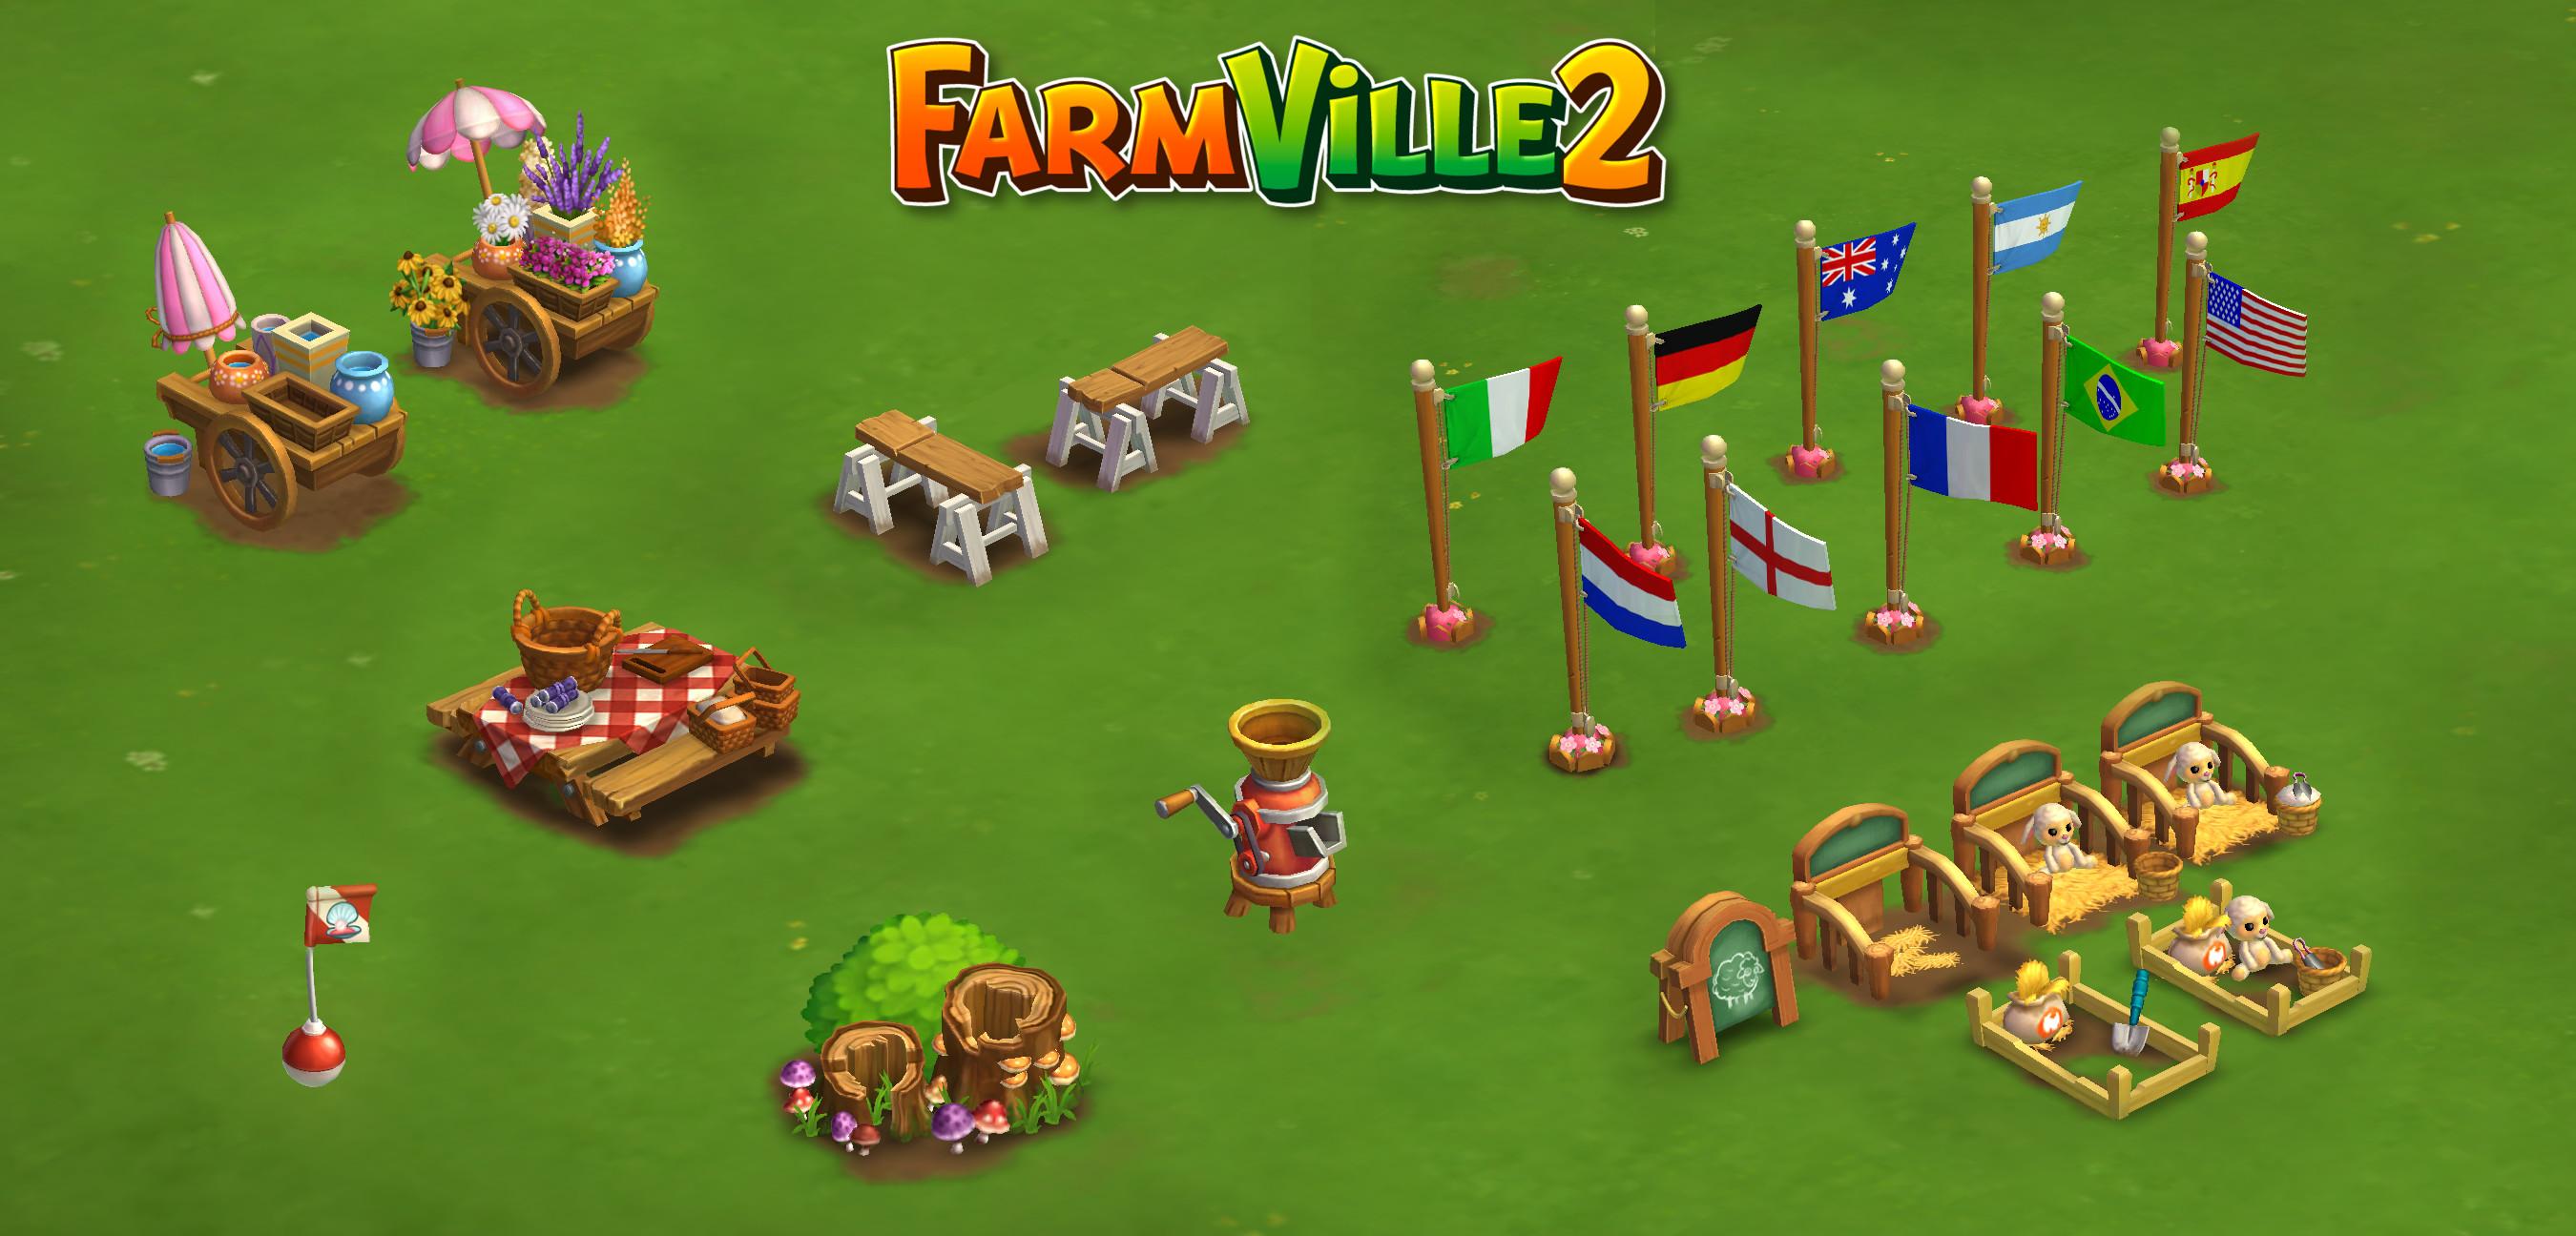 Farmville 2: Props